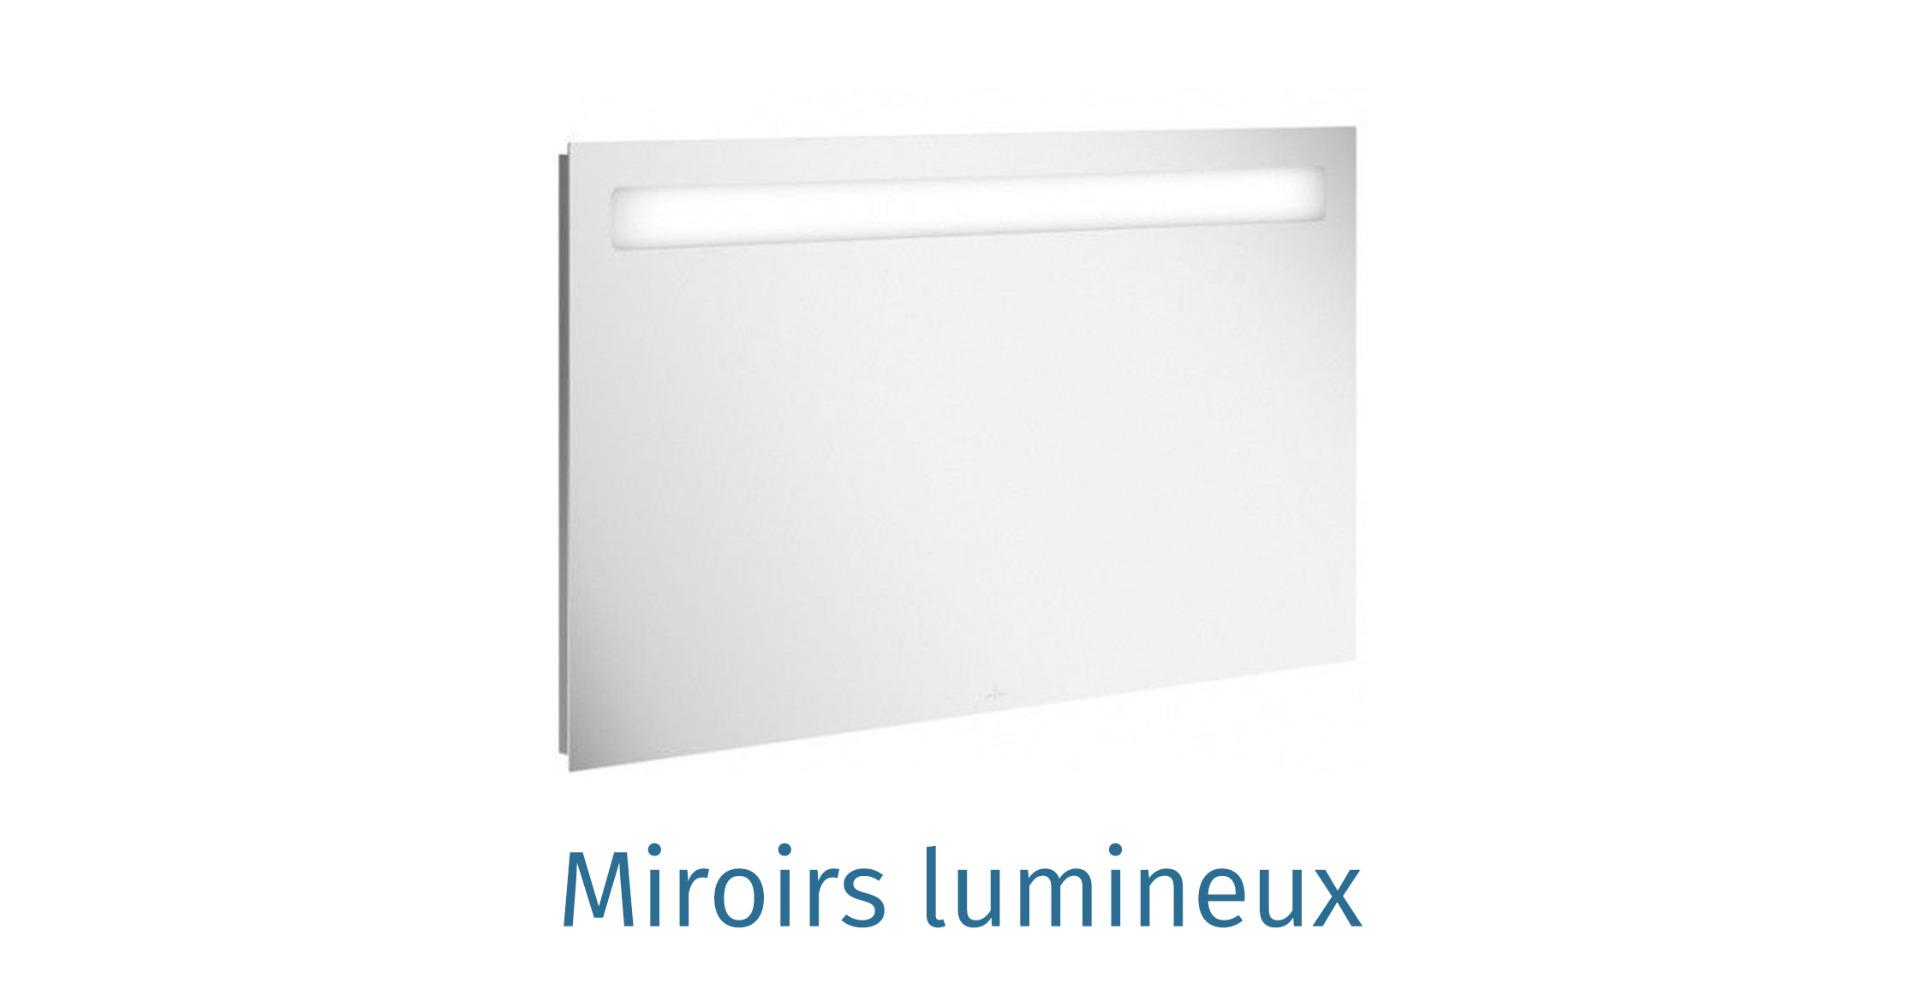 Miroirs lumineux